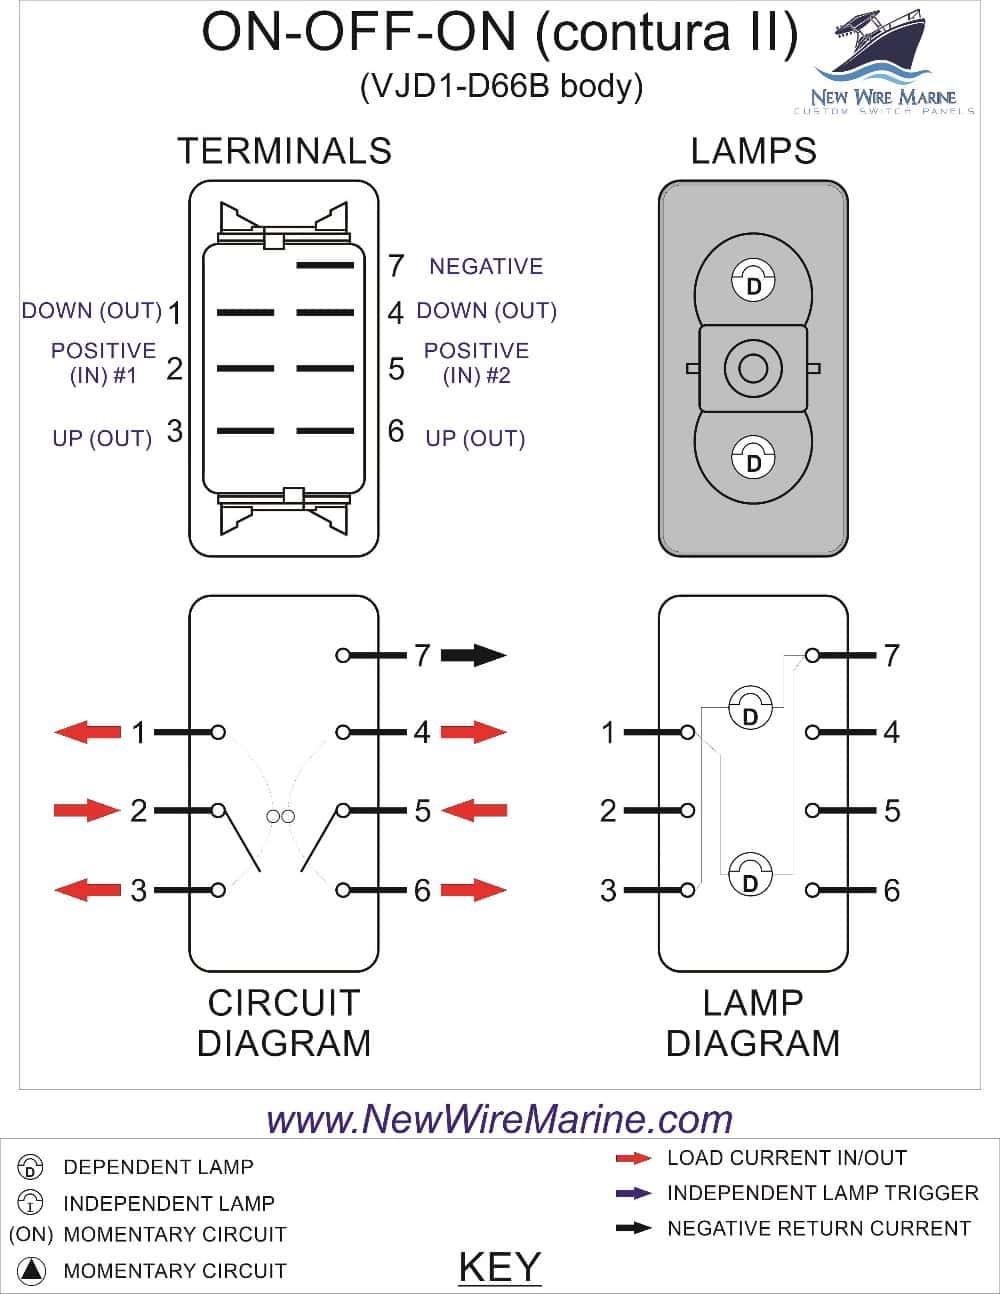 Boat Nav/anch Switch Wiring Diagram on